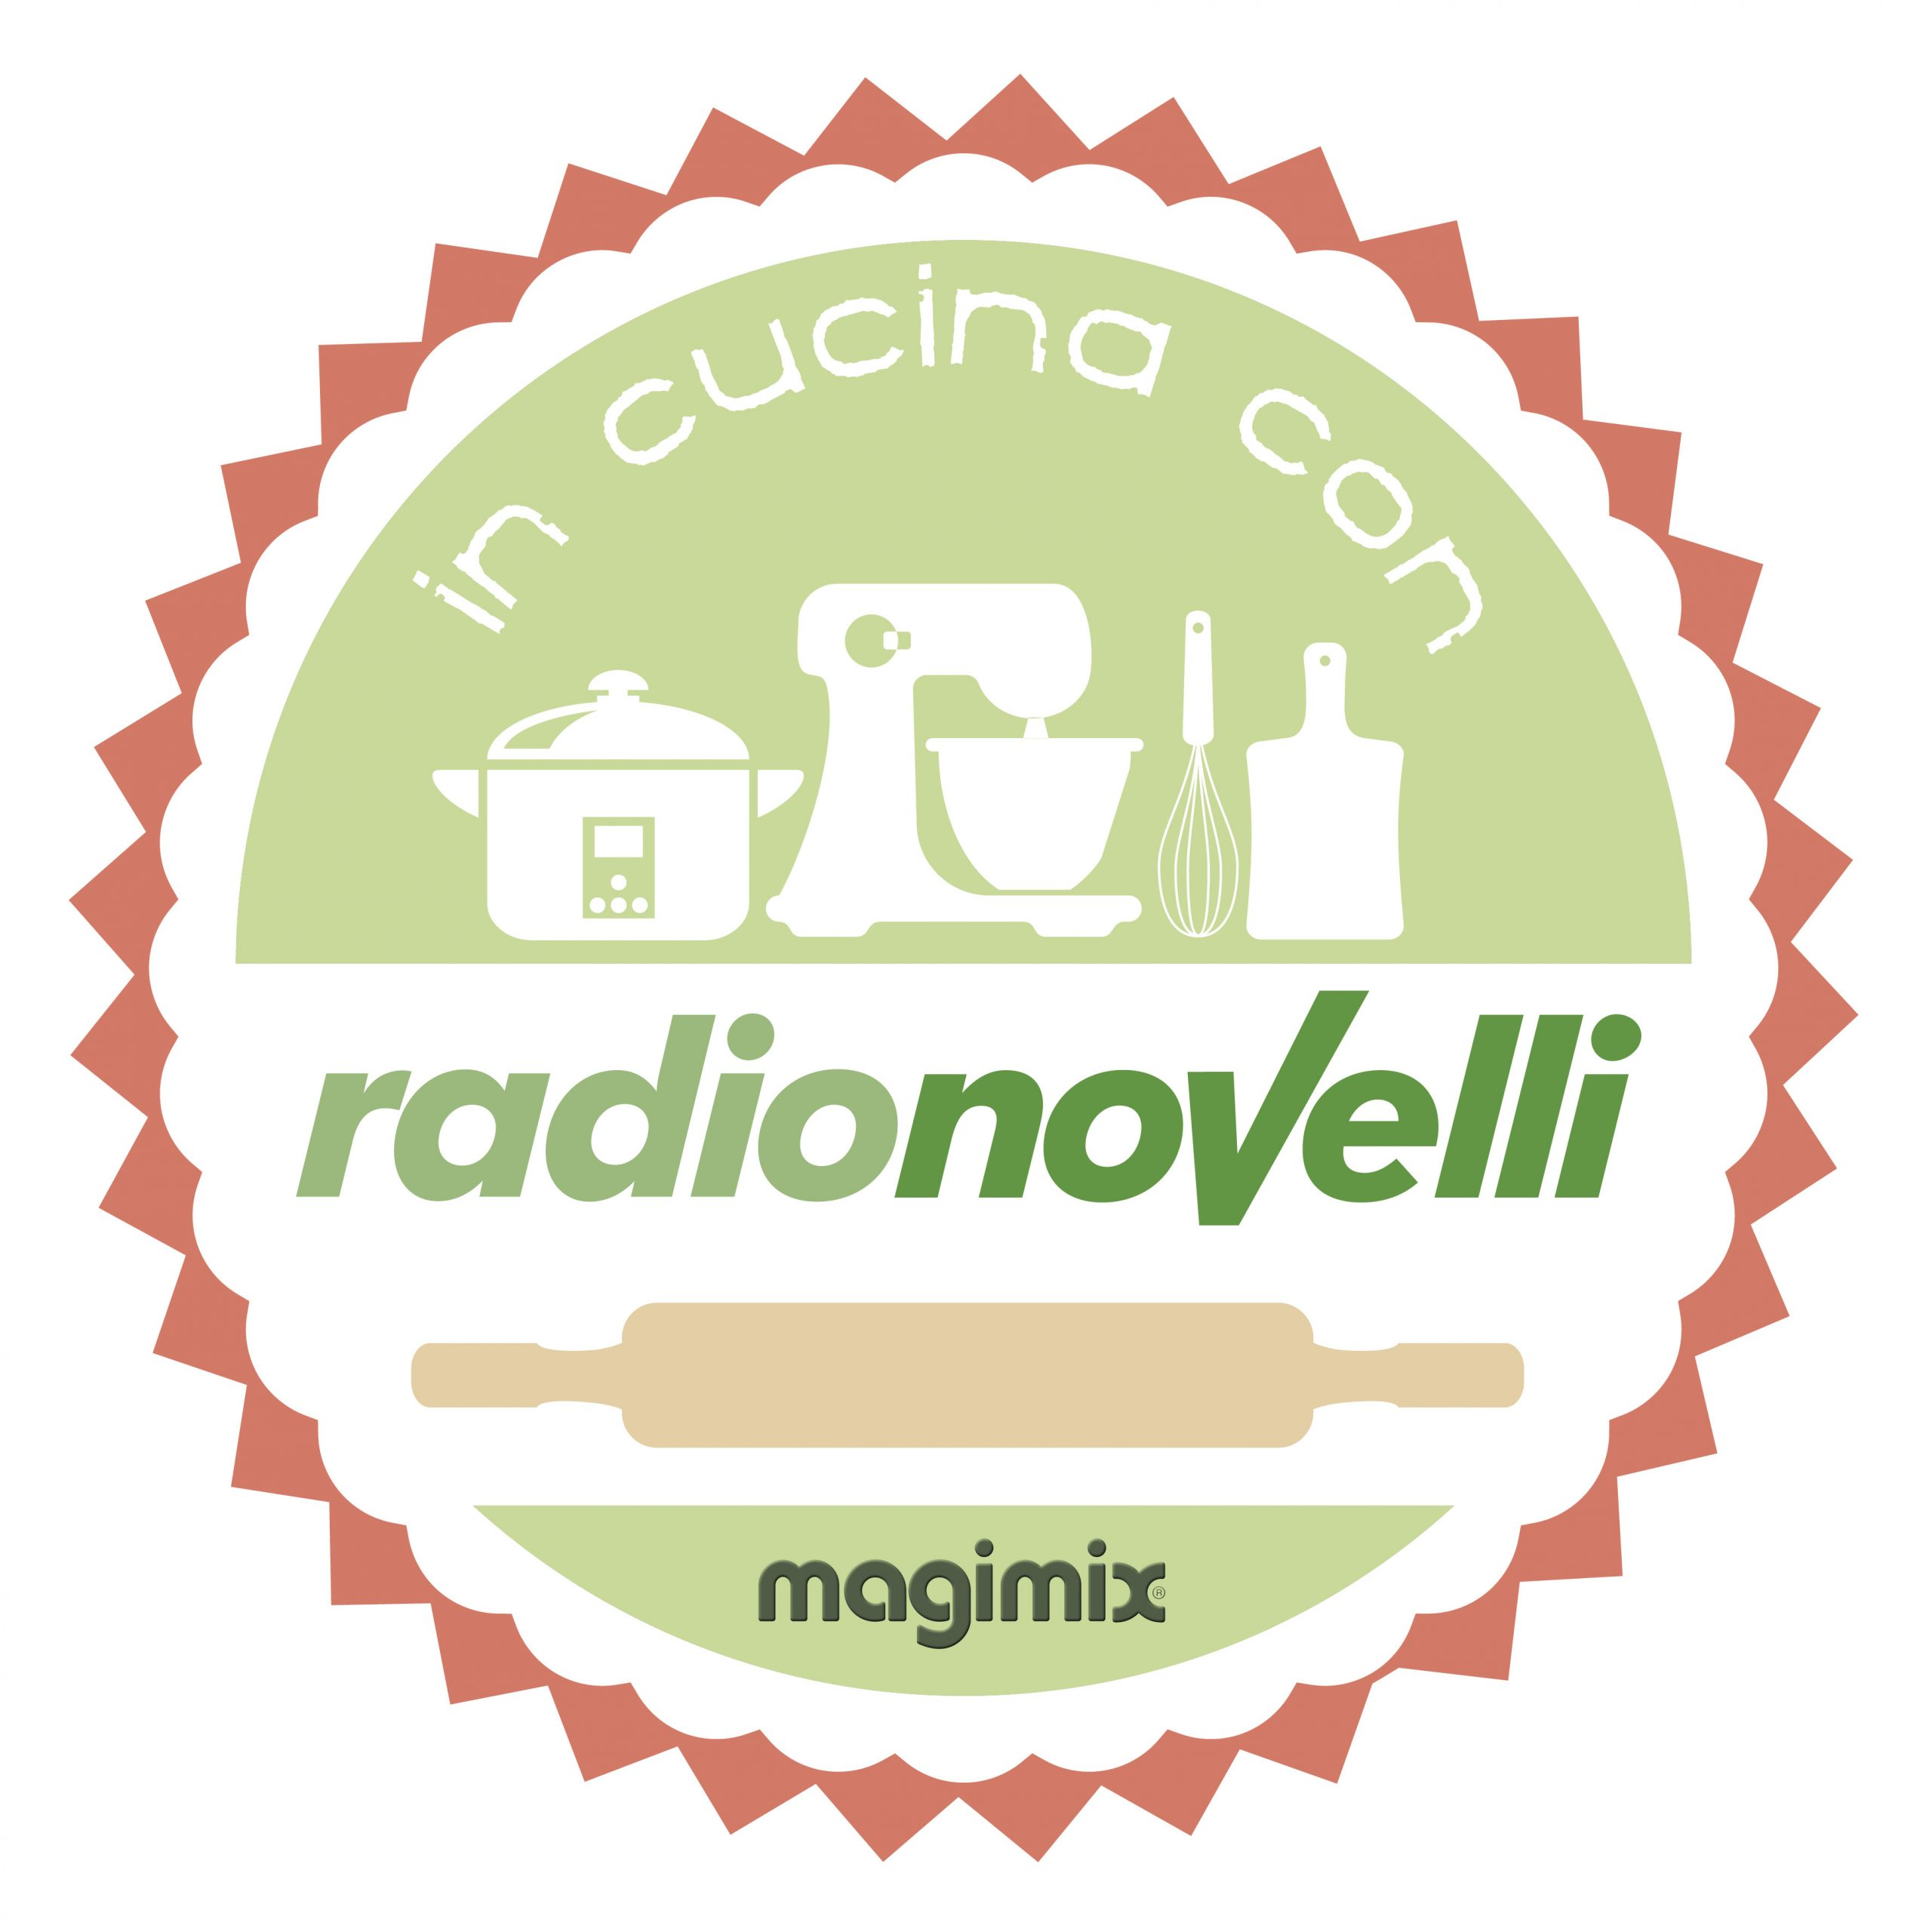 logo In CUCINA con RN magimix